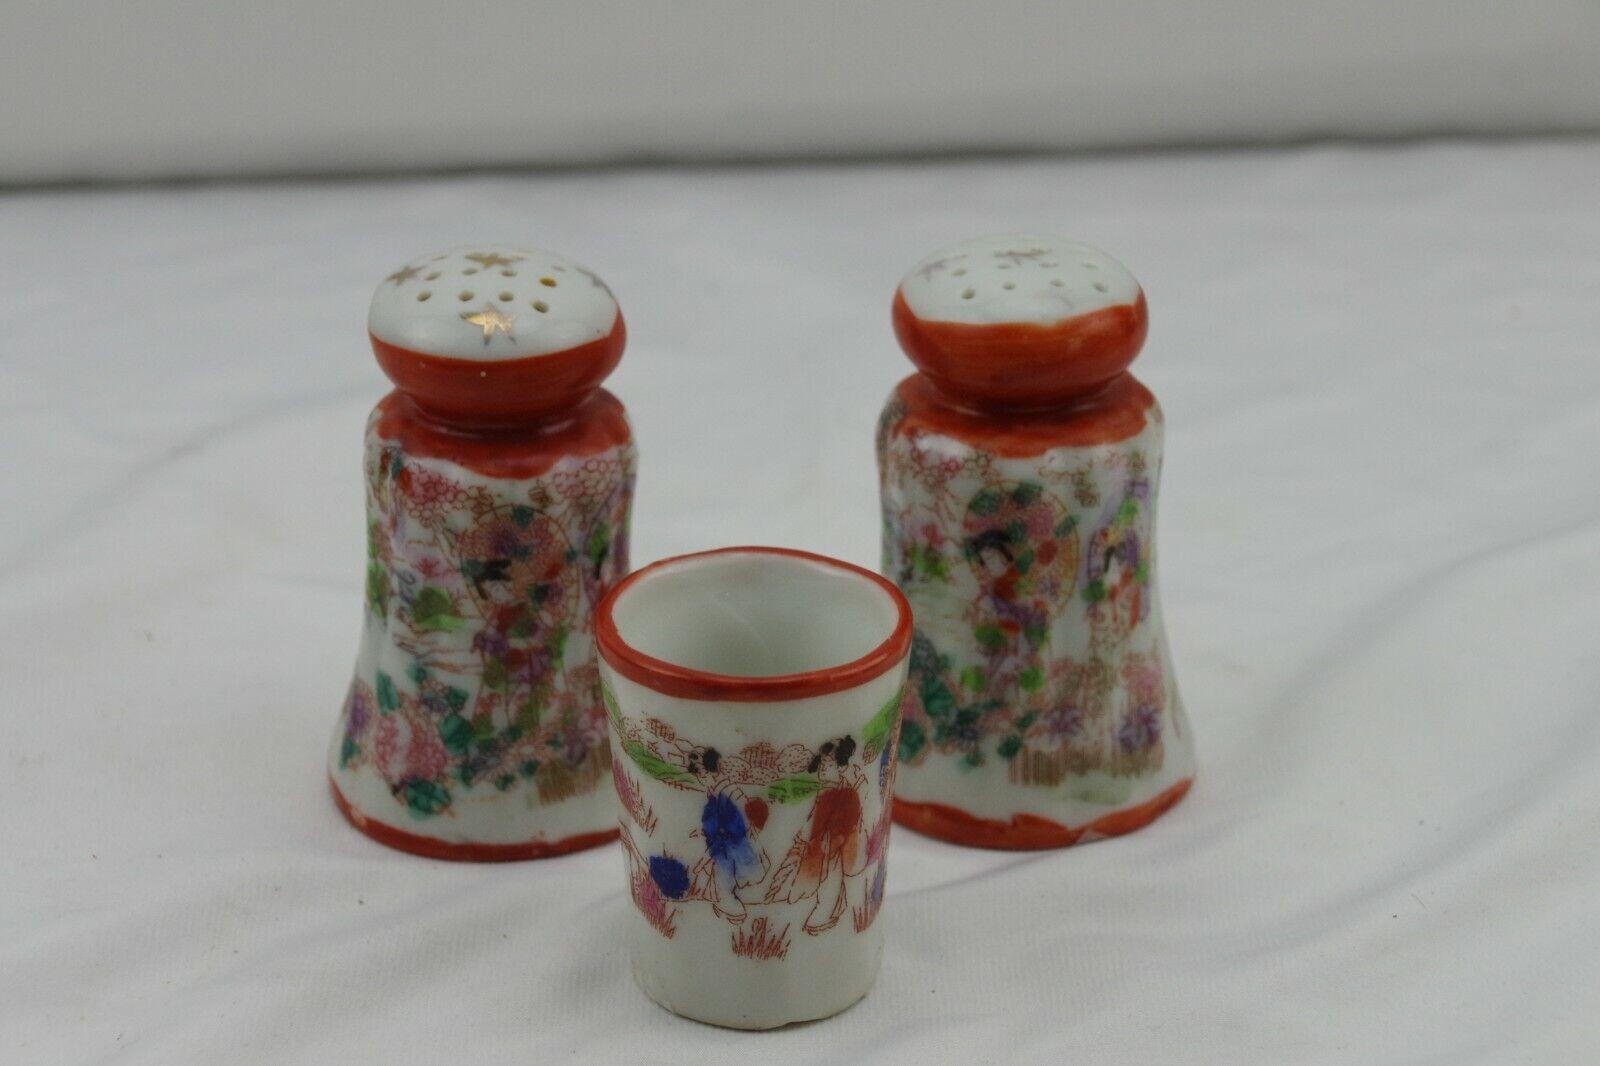 Japanese Kutani Satsuma Scenic Folk Art Large Salt Pepper Toothpick Holder Set - $11.99